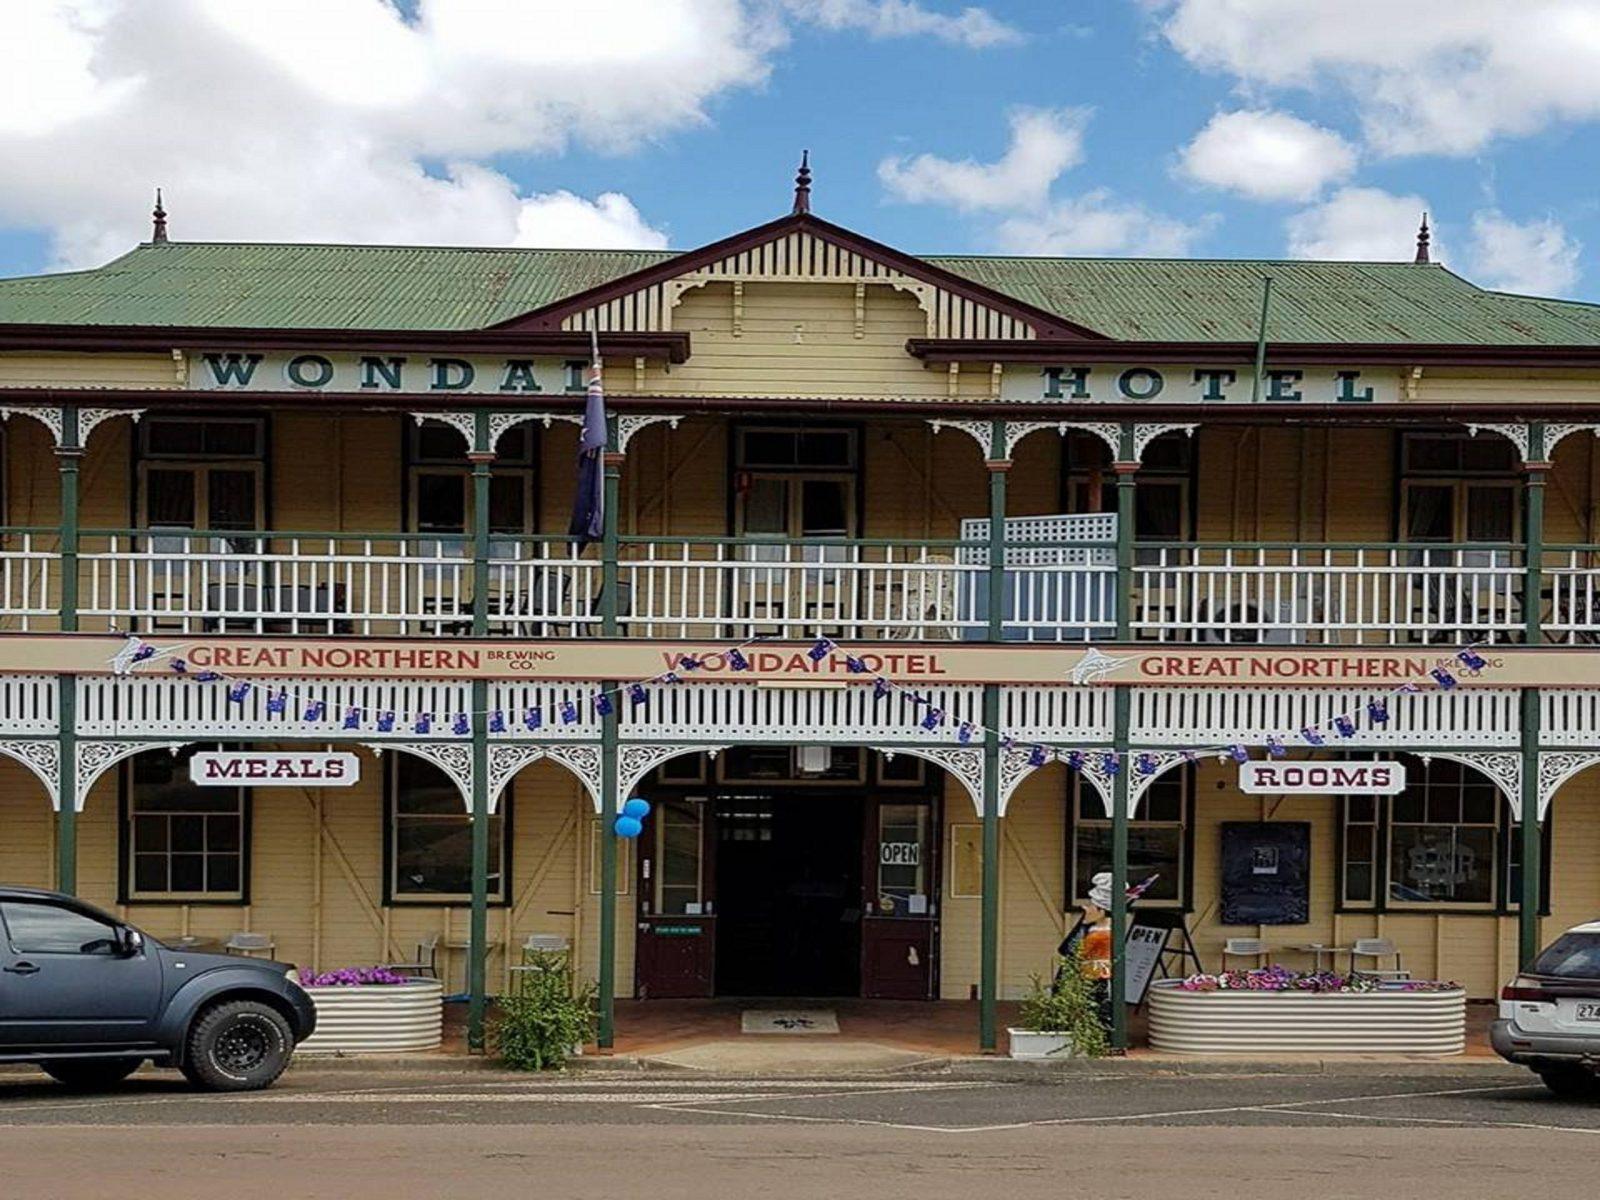 The Wondai Hotel